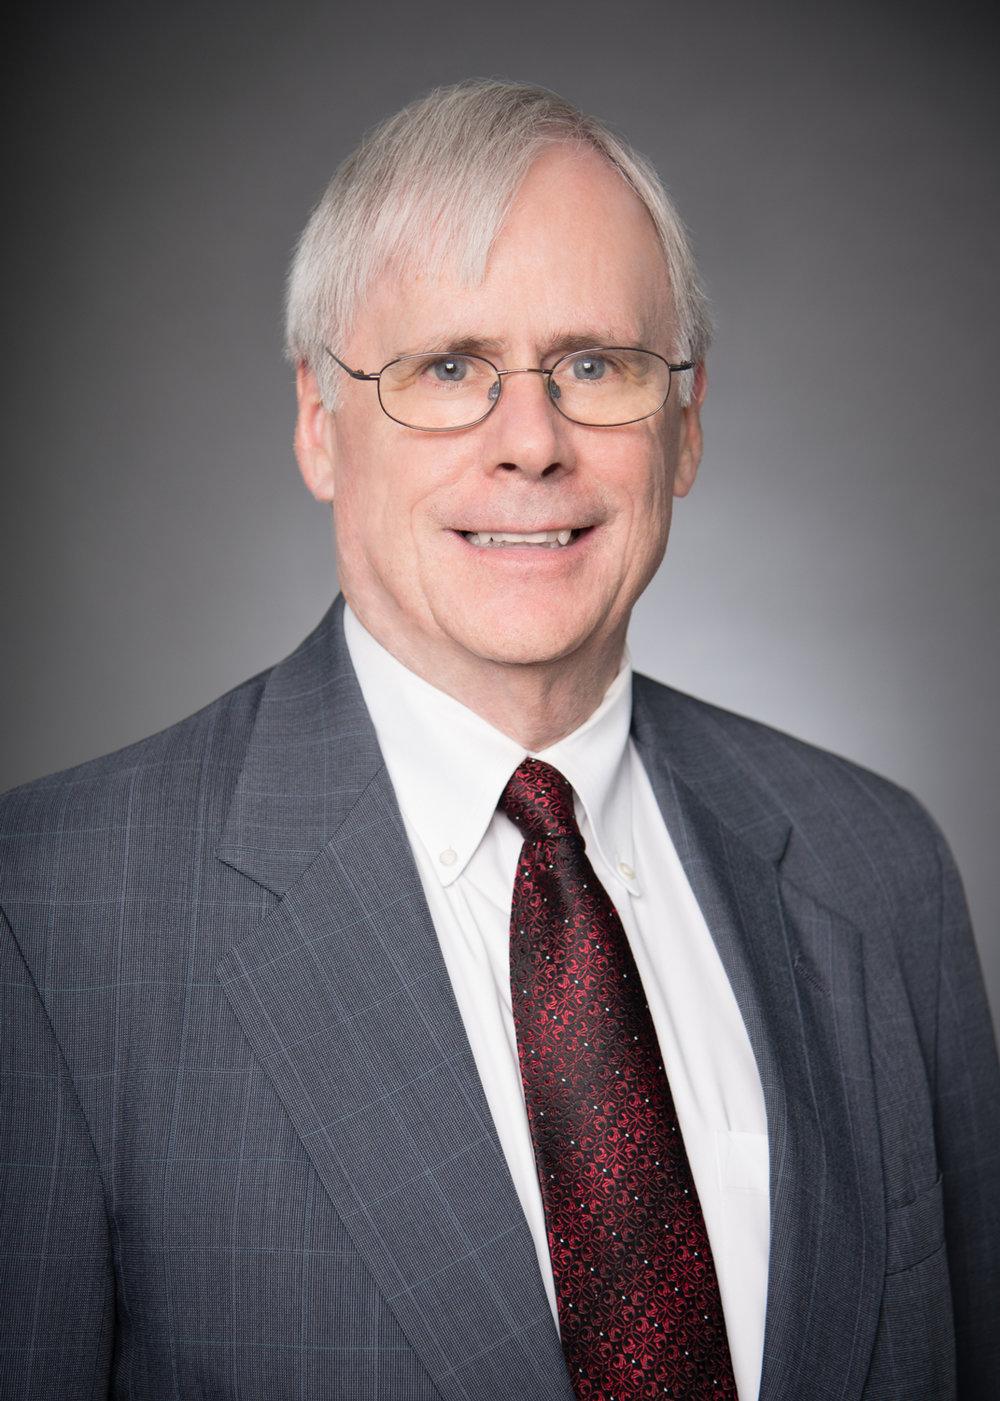 James R. Kanner